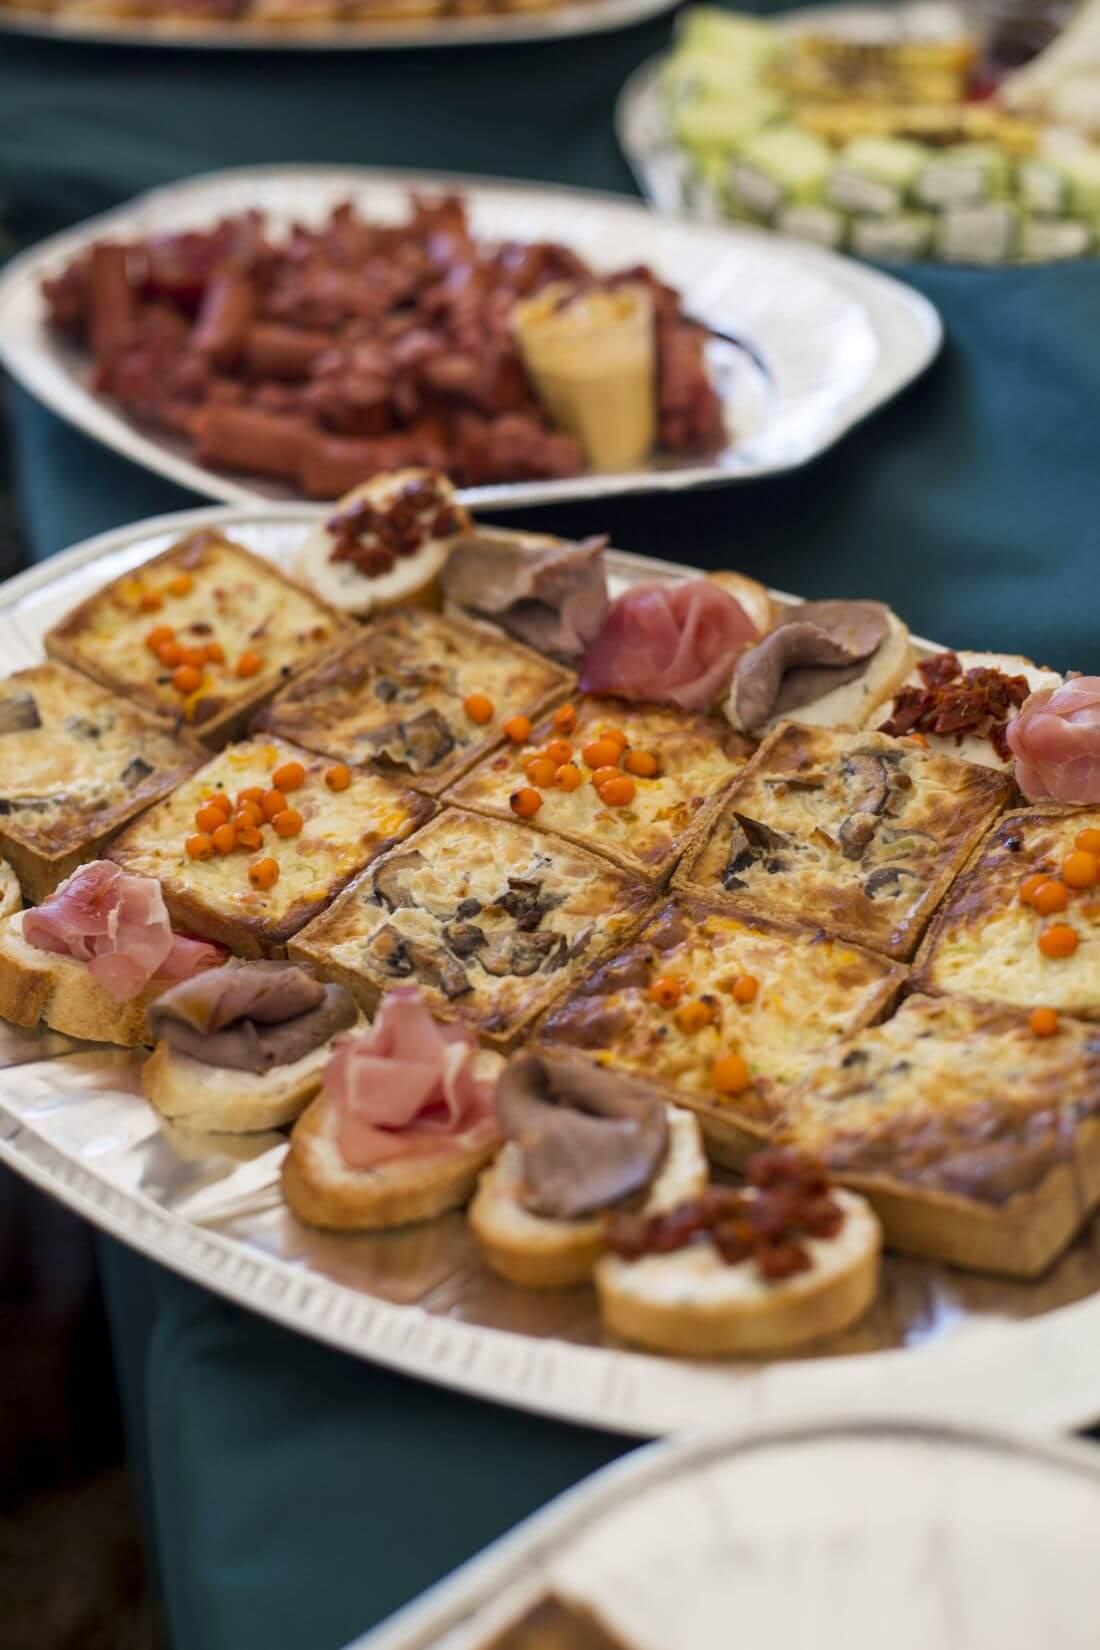 Catering Evenimente - In Bucate Catering - Festivalul Catinei Gaiesti - 1170px - 5